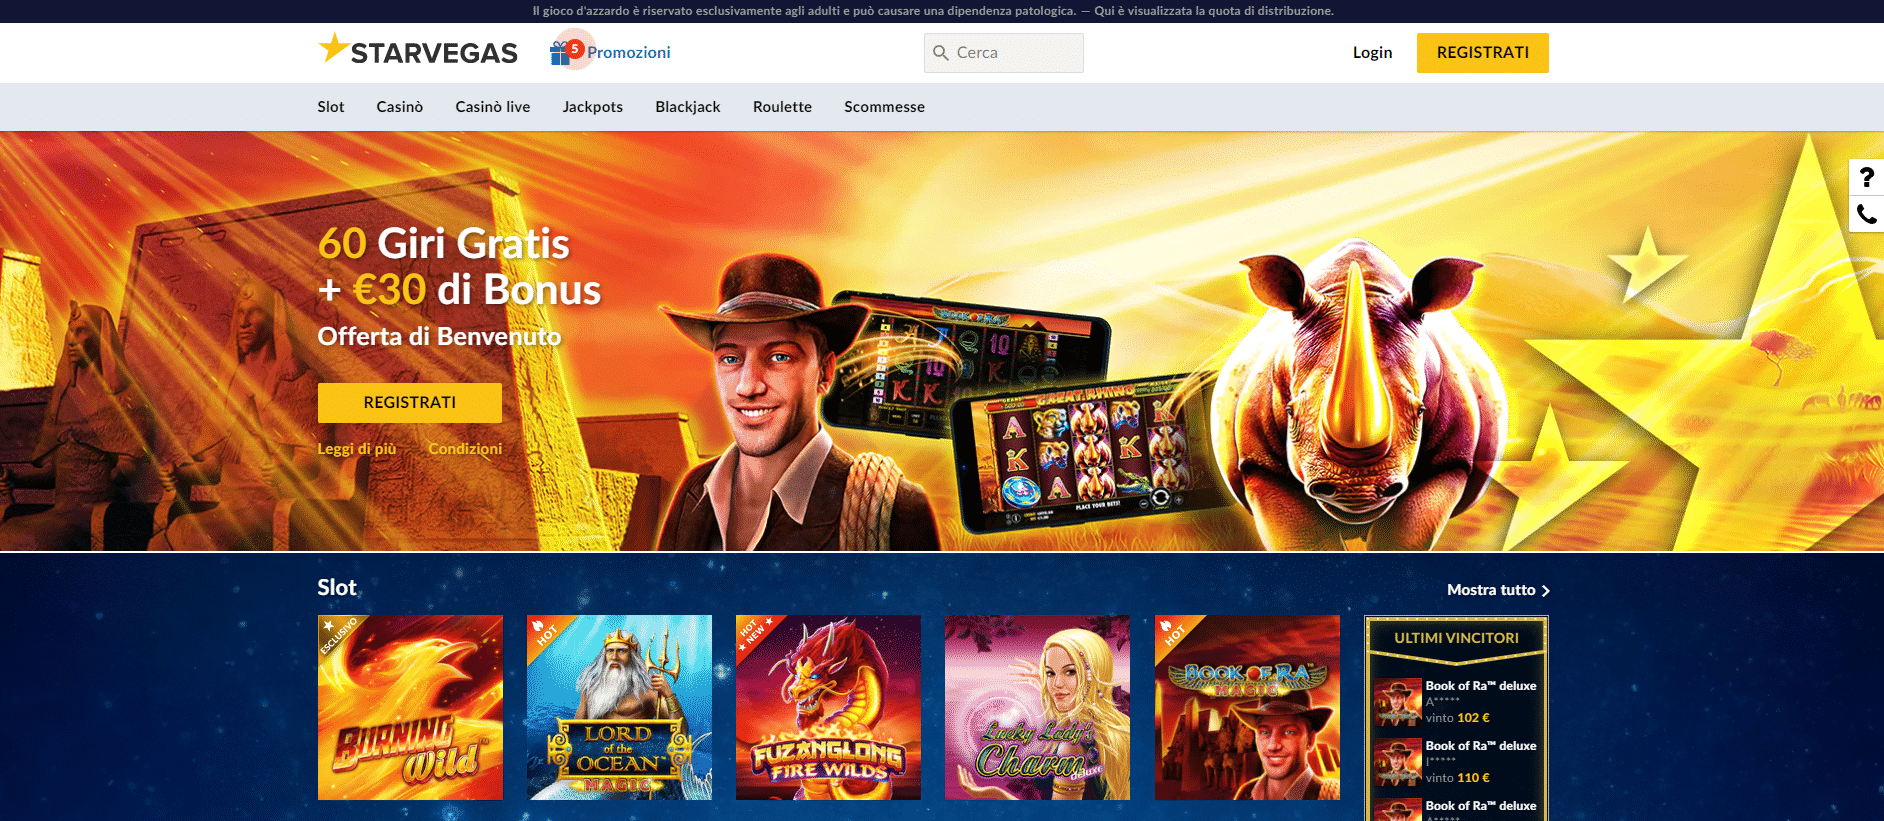 Starvegas Homepage